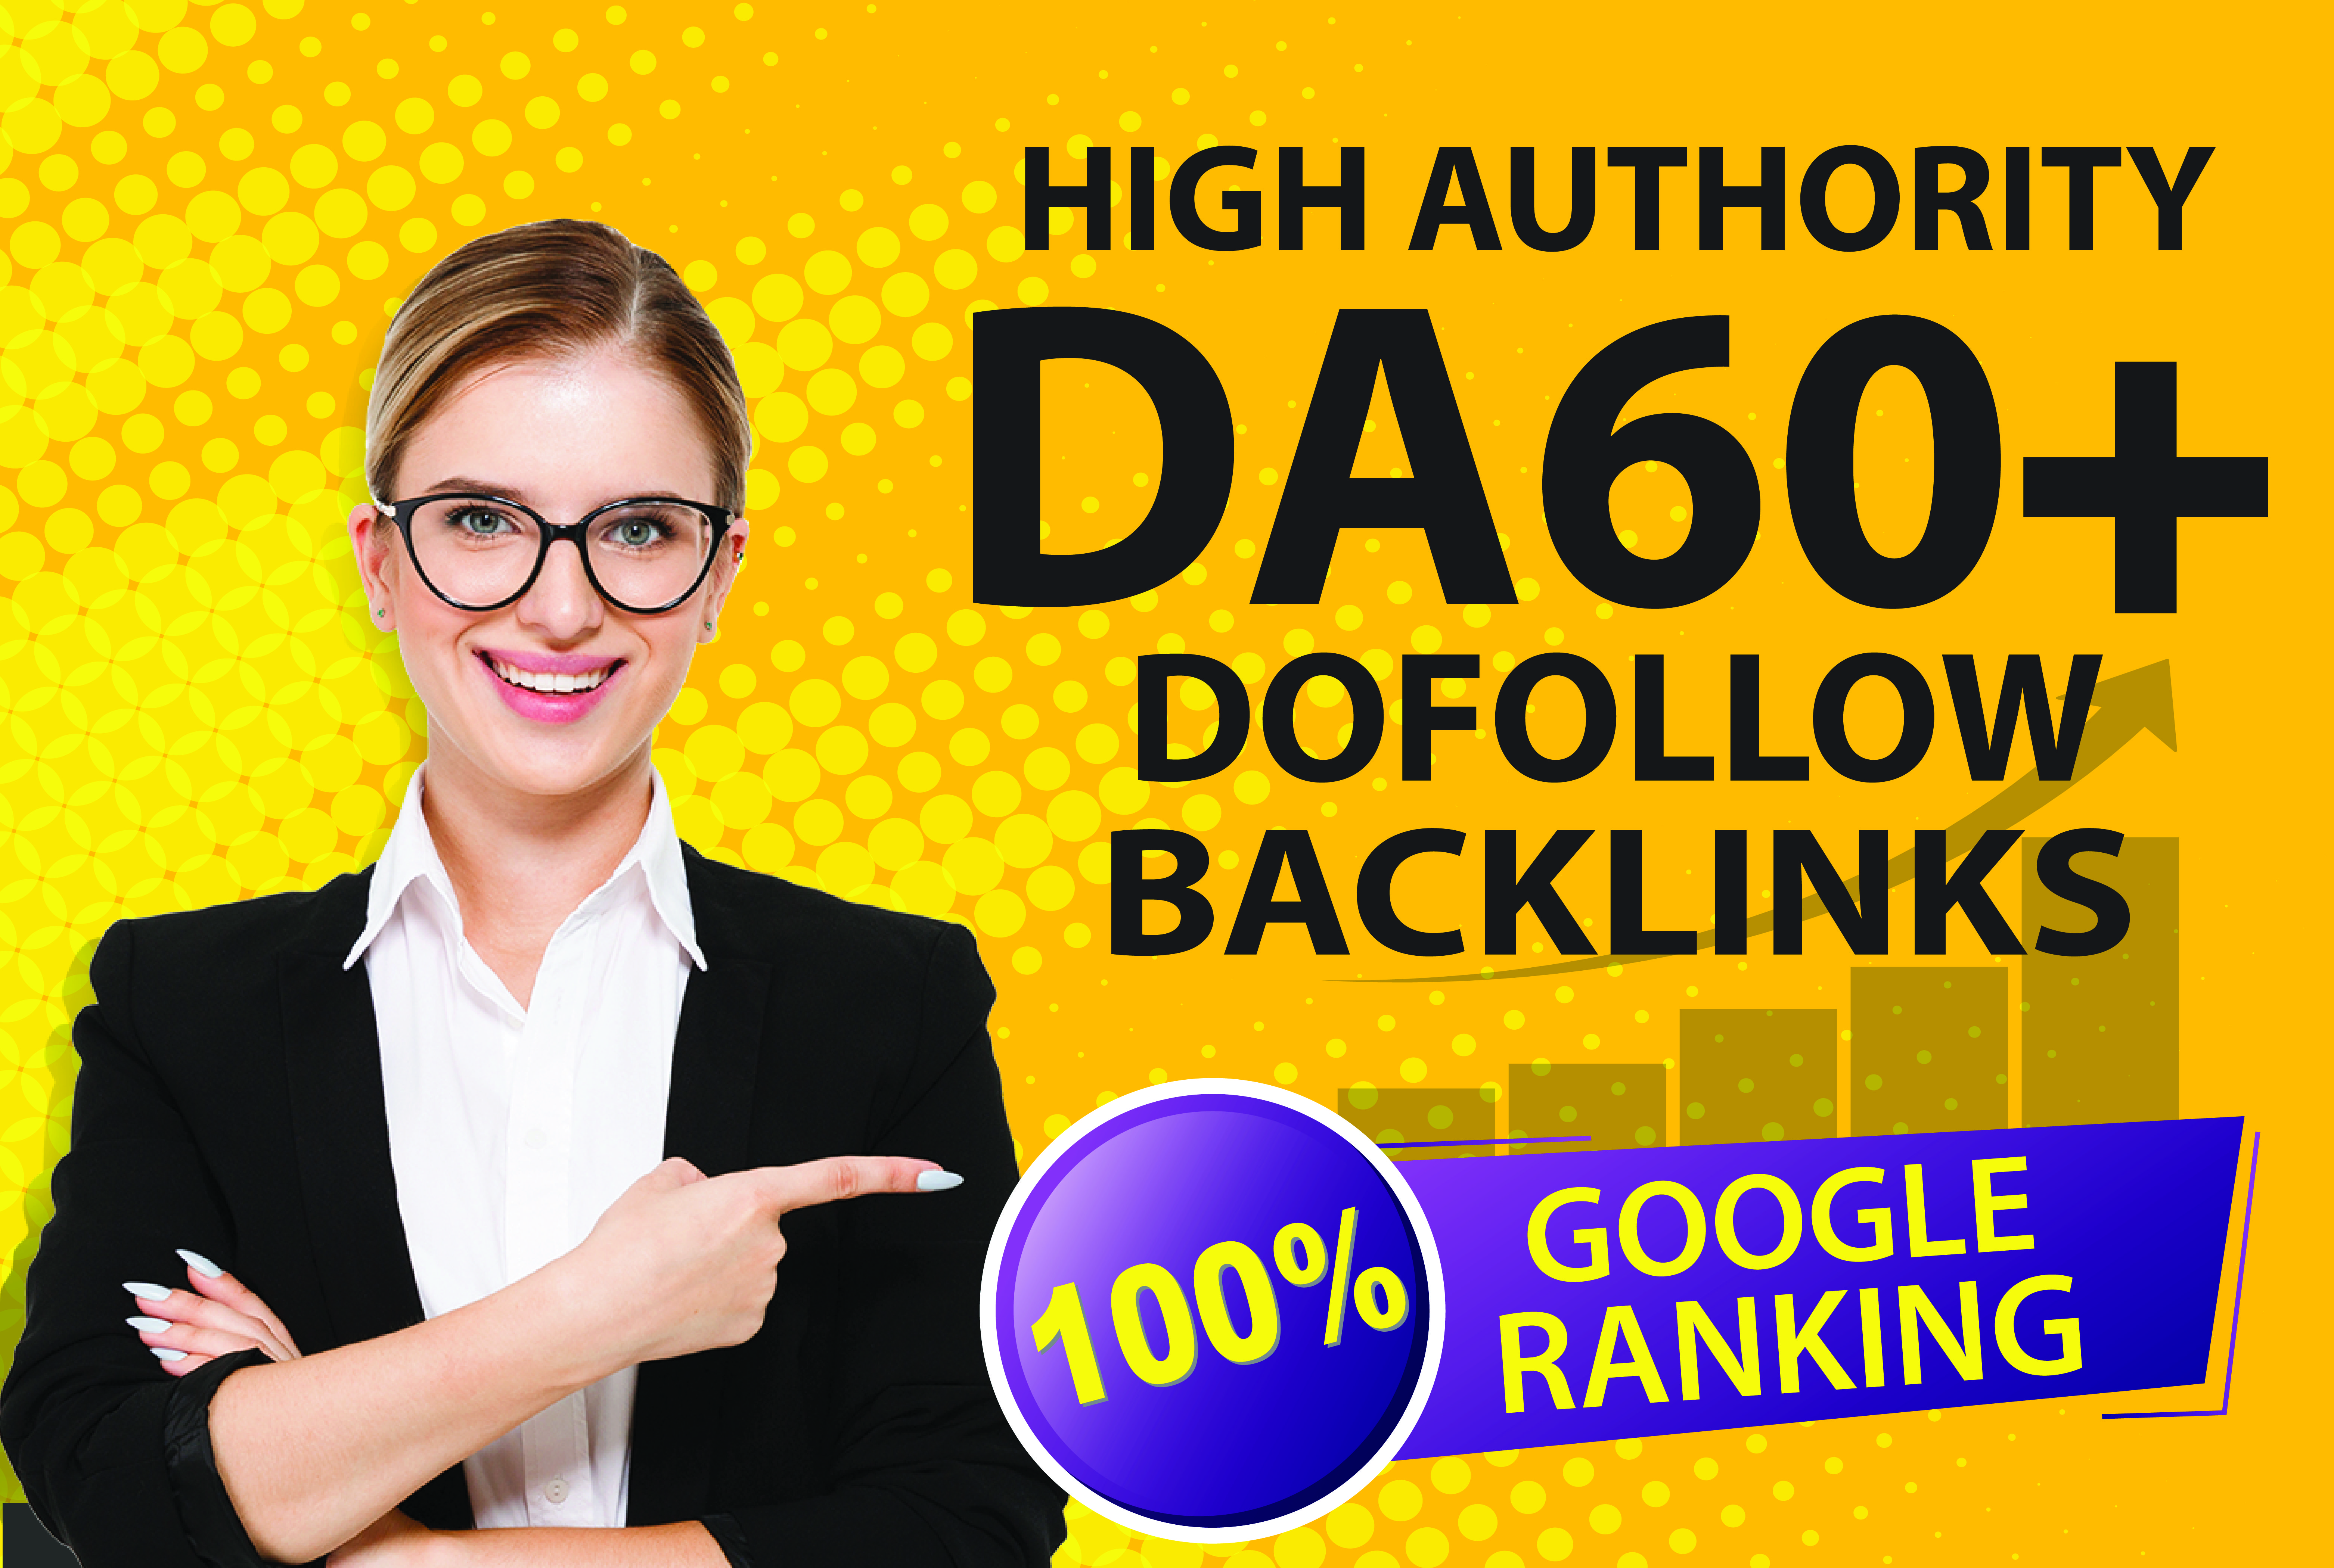 I will do 100+ high authority manually Dofollow backlinks & excellence SEO service